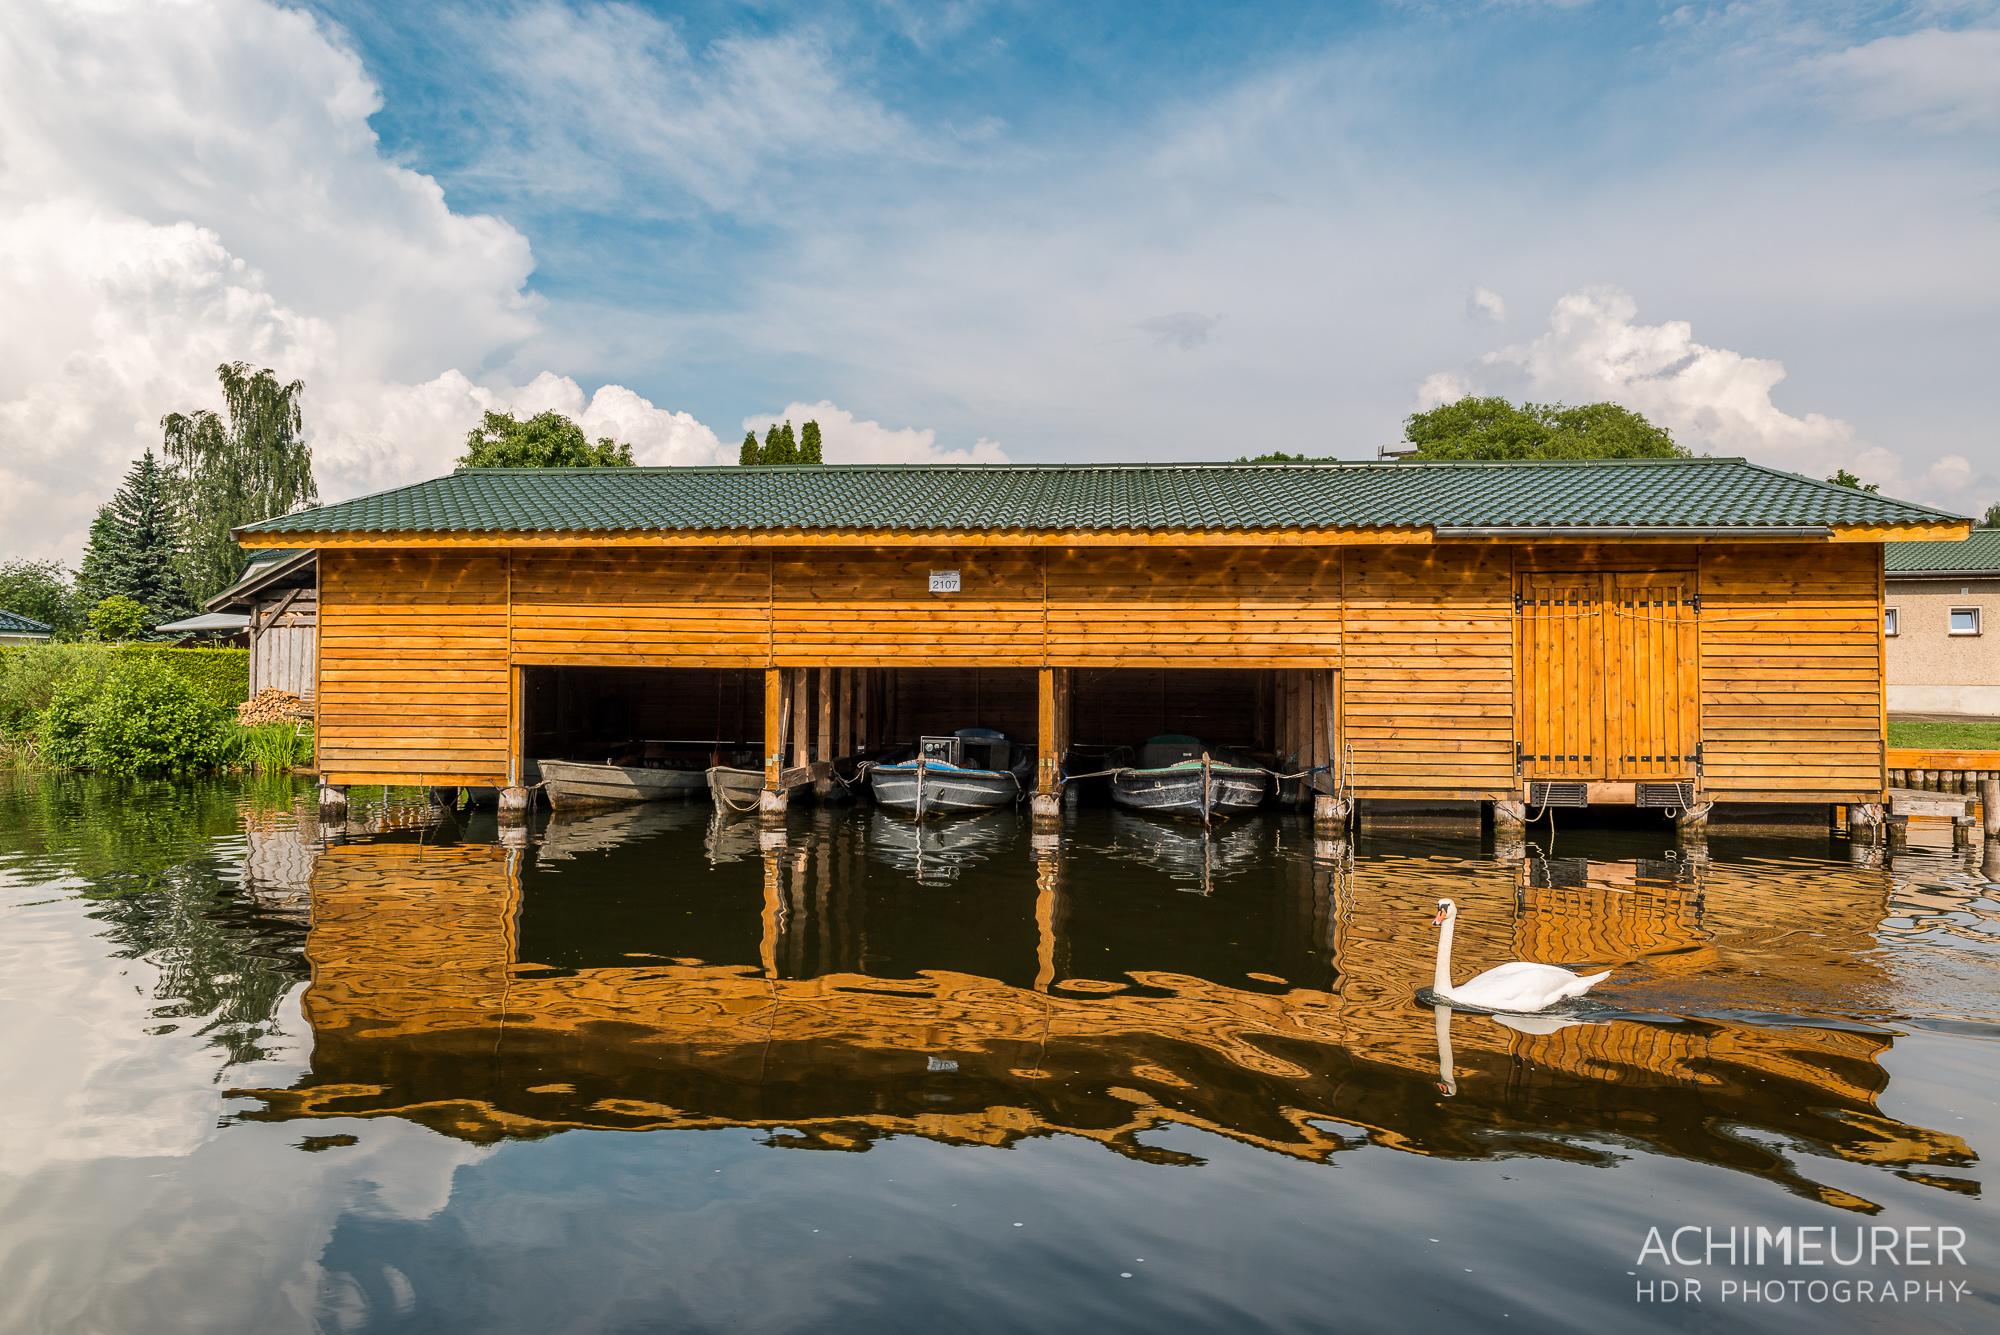 Hausboot-Kuhnle-Mueritz-Mecklenburg-Vorpommern-See_2618